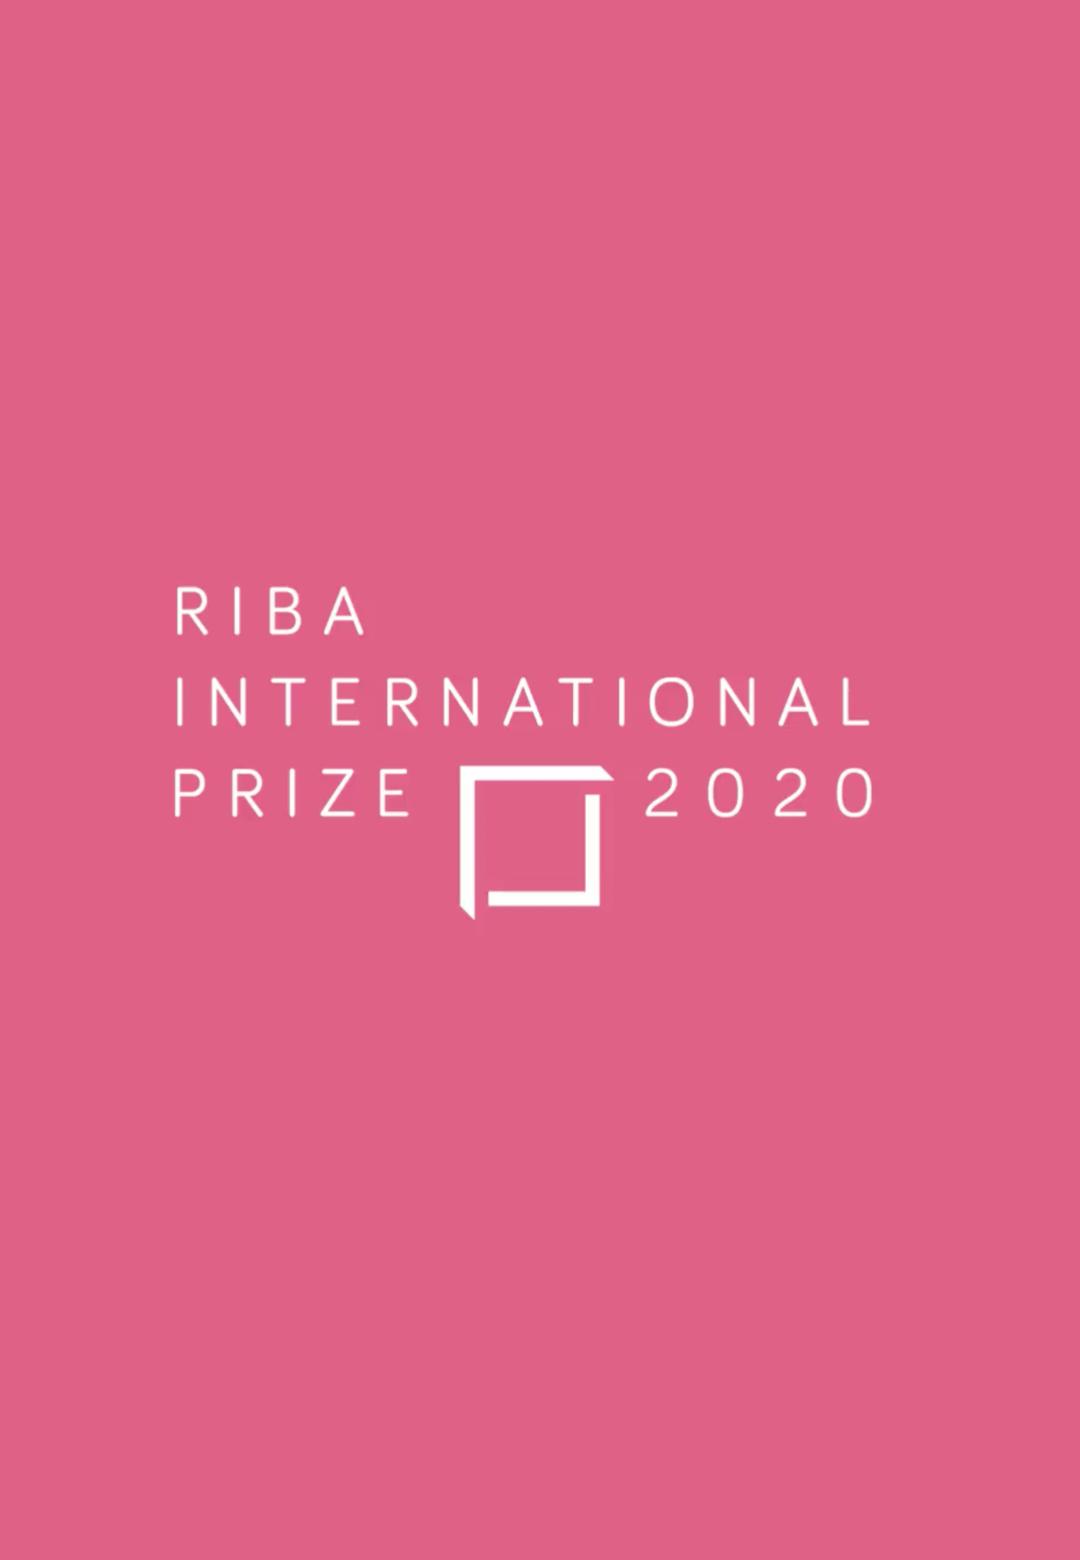 Call for Entries - RIBA International Awards 2020